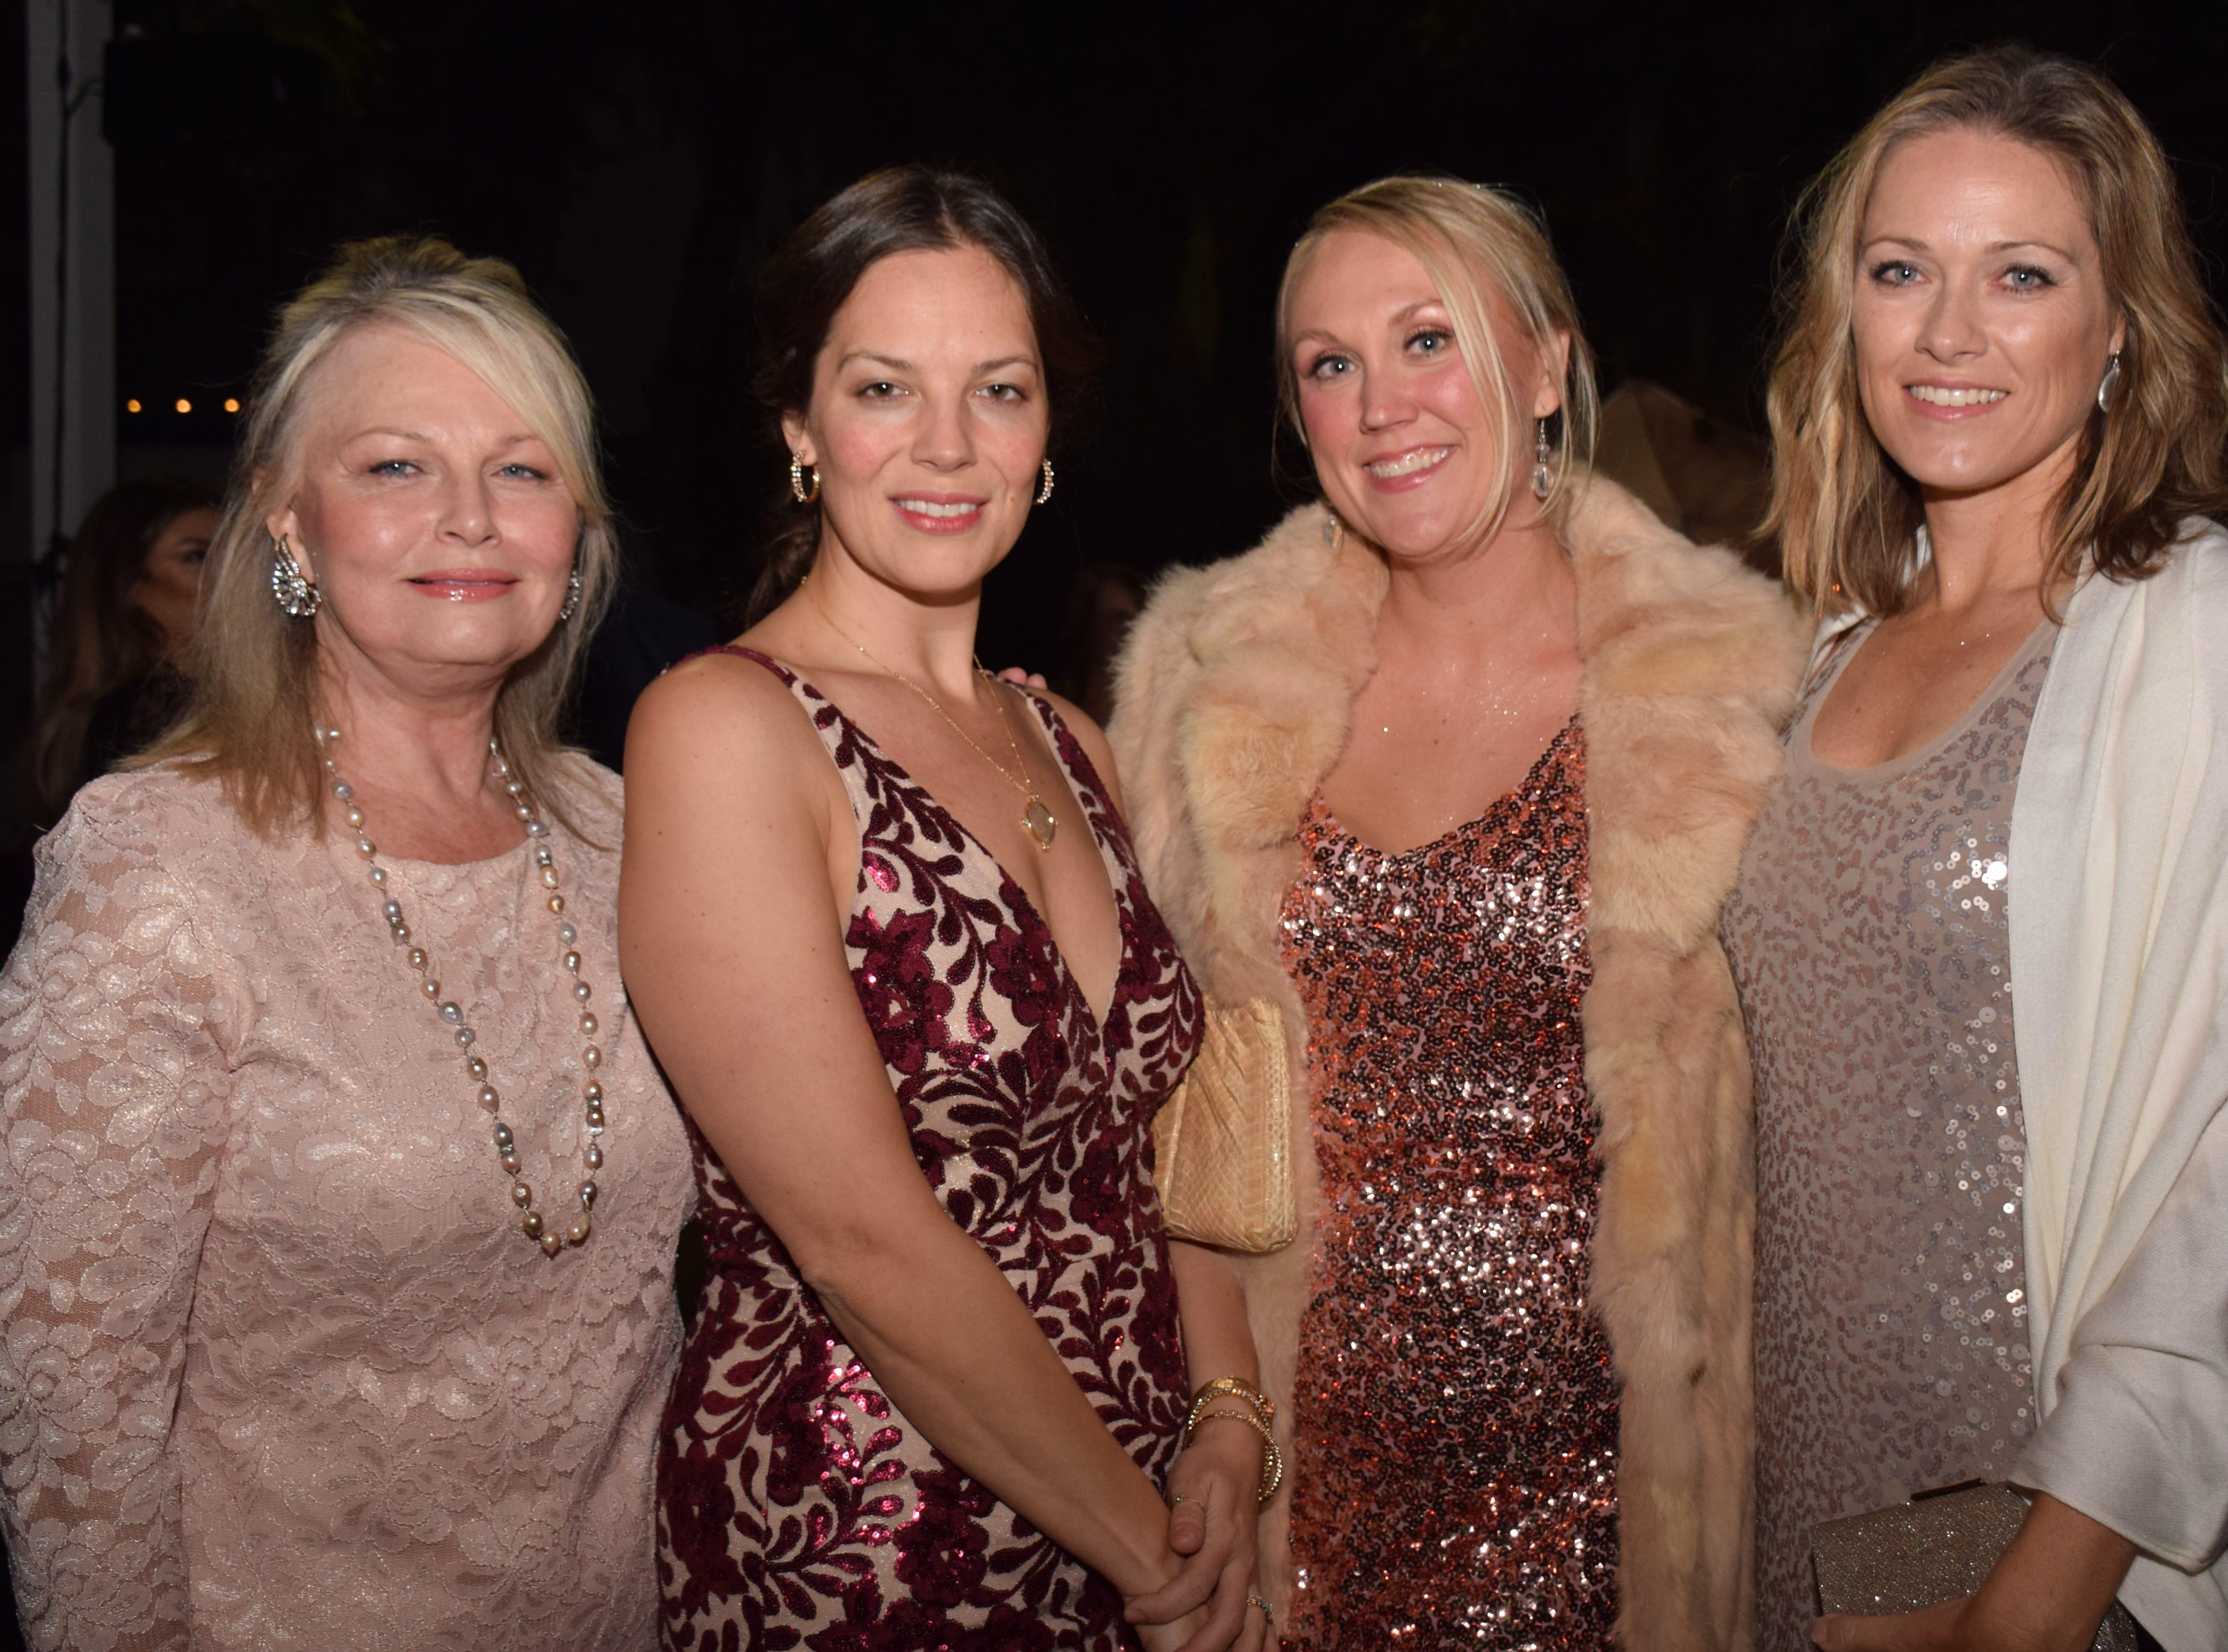 Connie Foster, Victoria Kerkela, Heather Soultzman and Robyn Flick